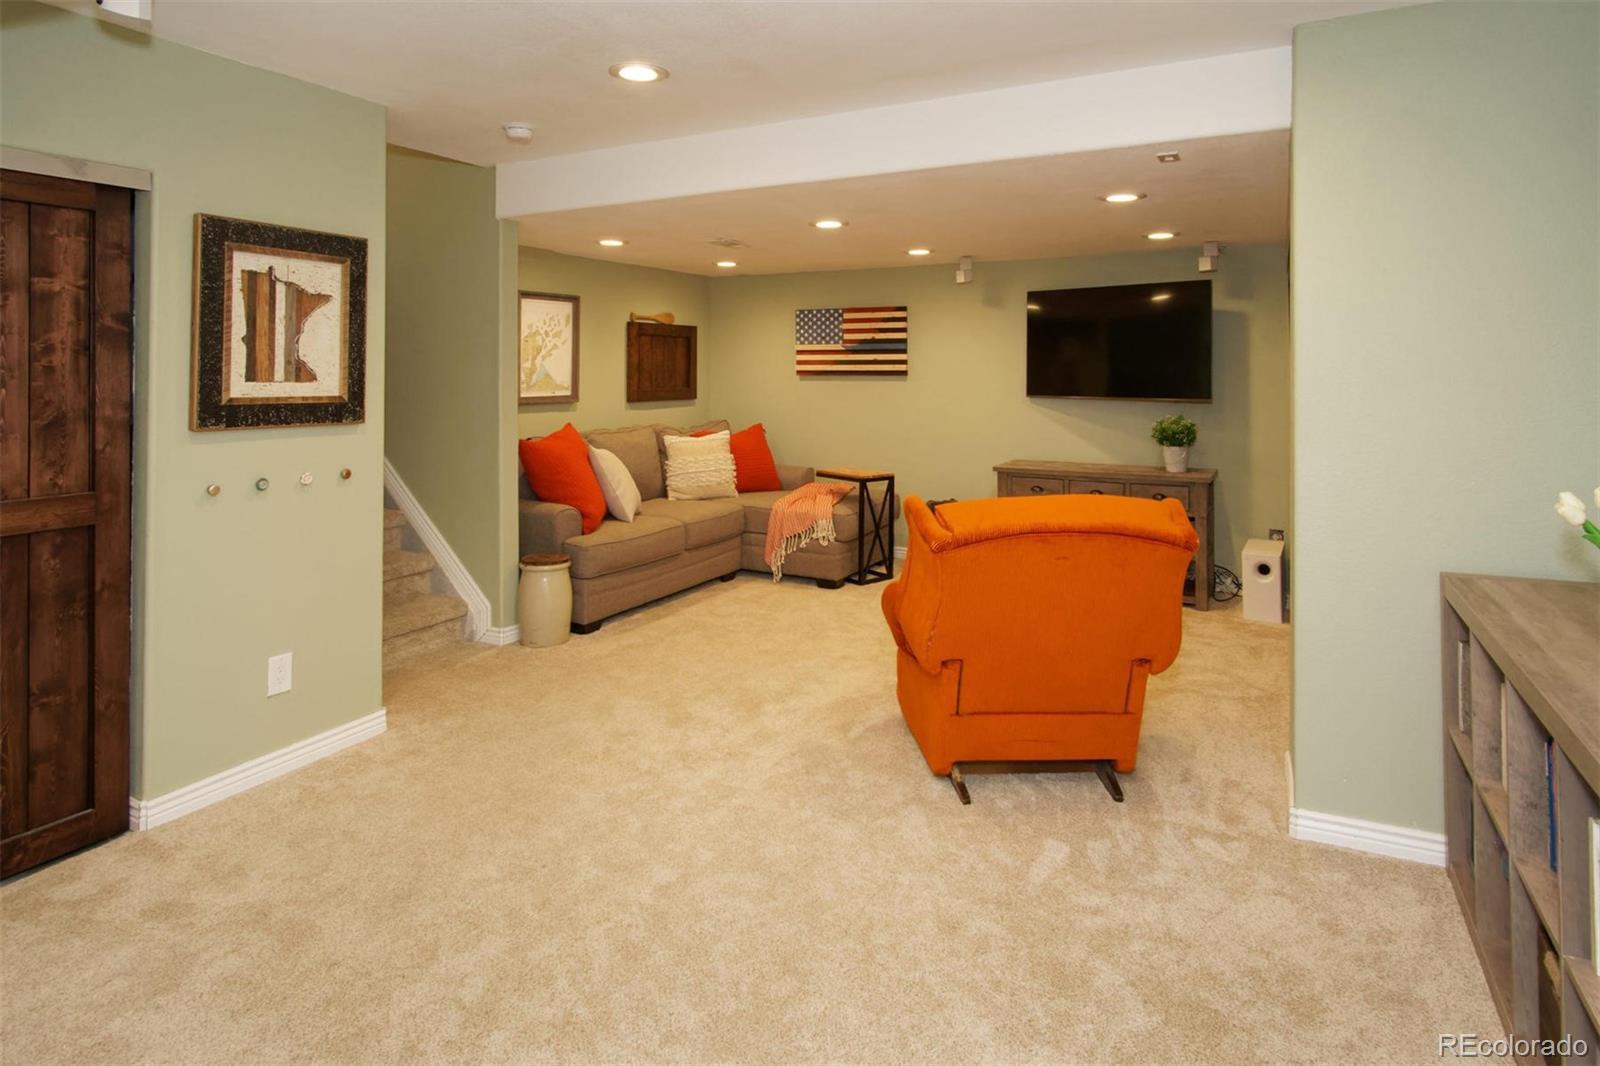 MLS# 1588259 - 33 - 11326 W Crestline Drive, Littleton, CO 80127